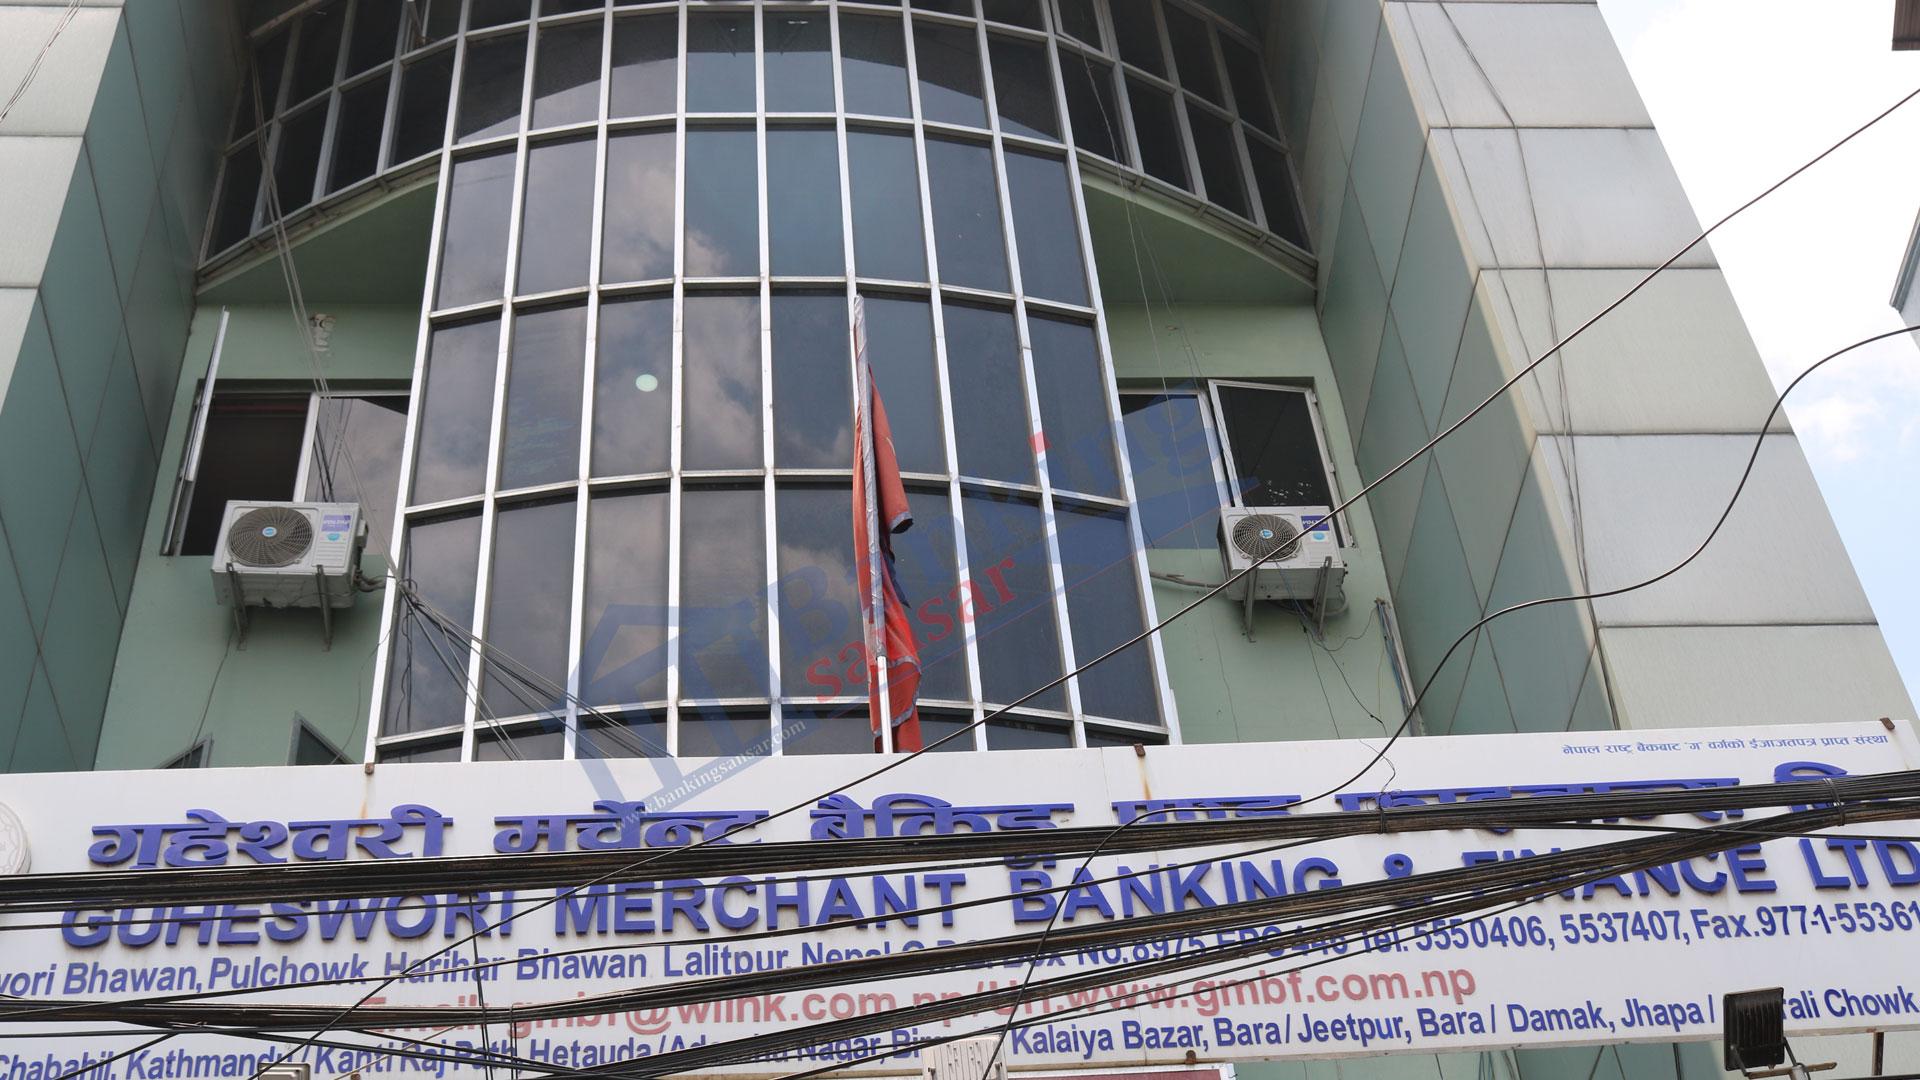 Guheswori Finance